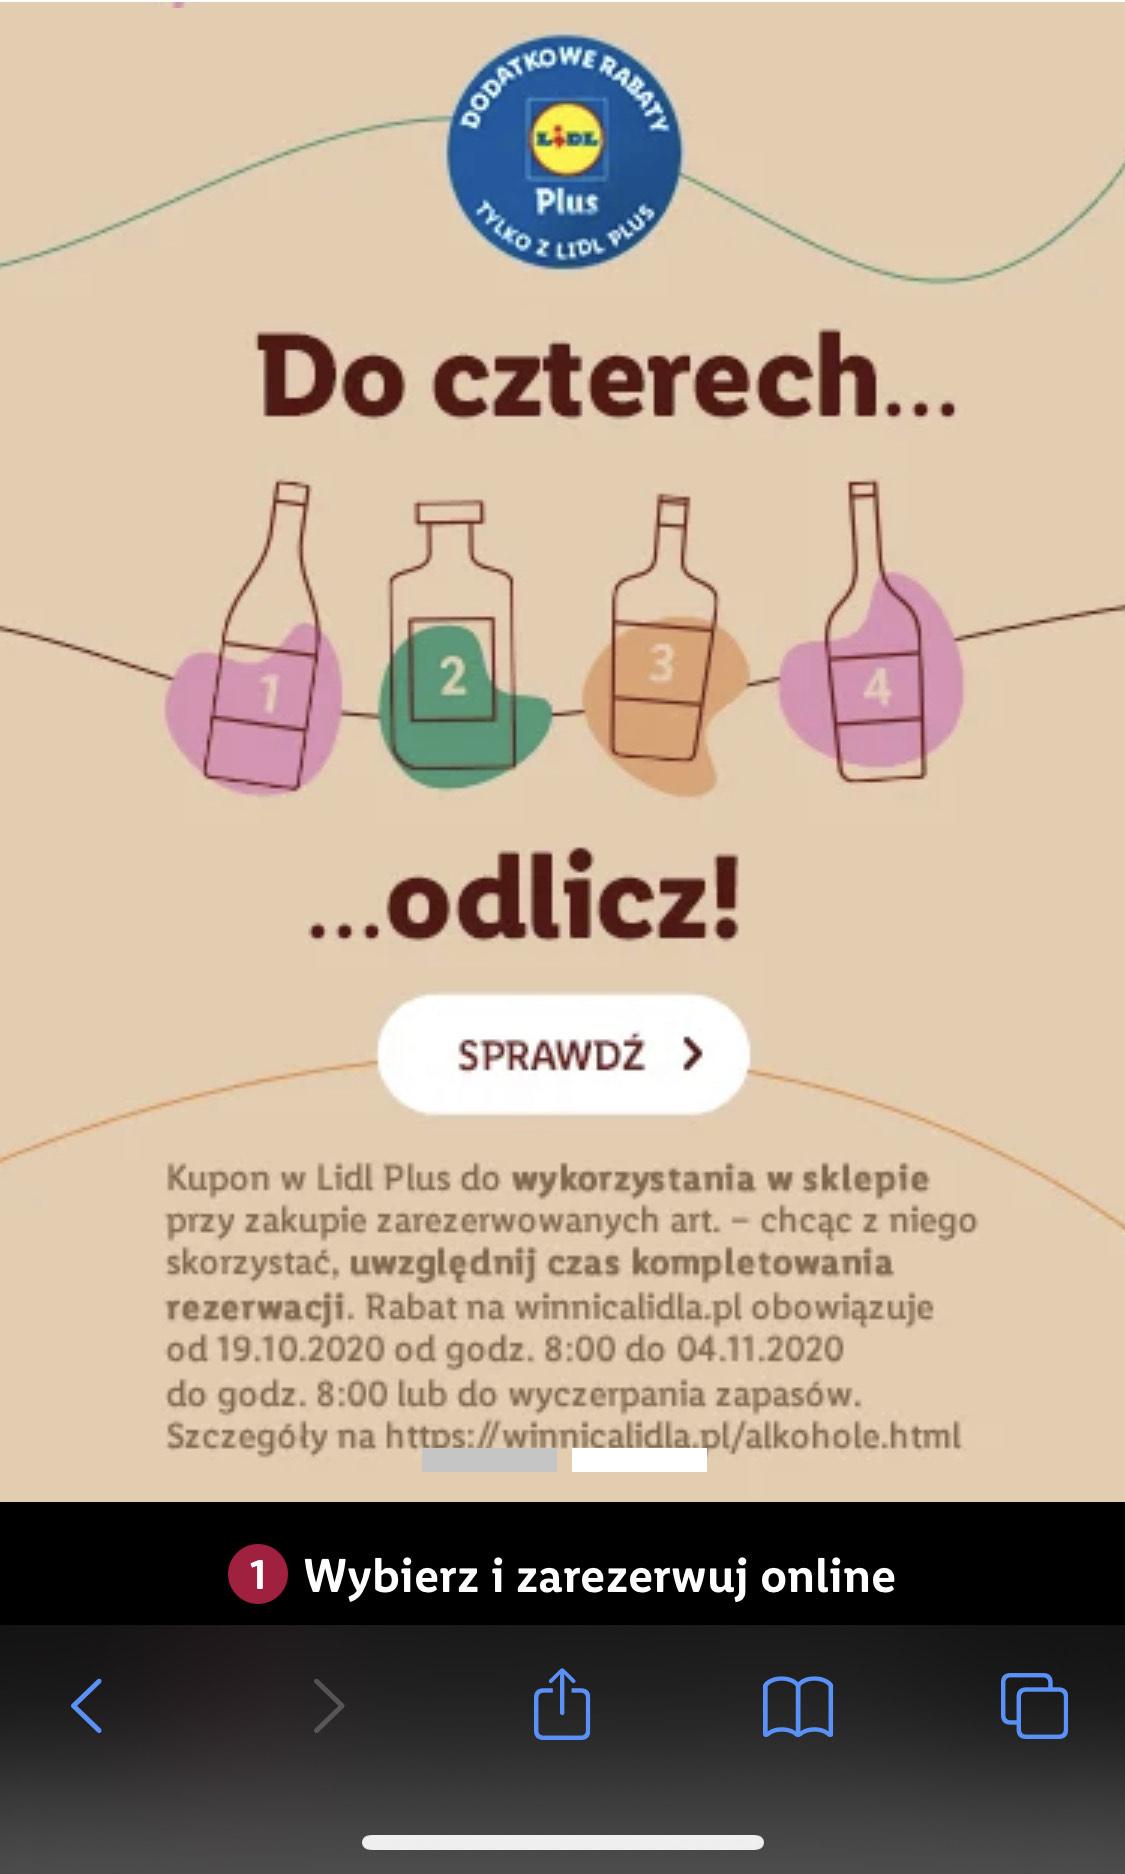 Winnica Lidla 10% możliwe -27% przy zakupie 4 butelek + kupon LidlPlus + newsletter